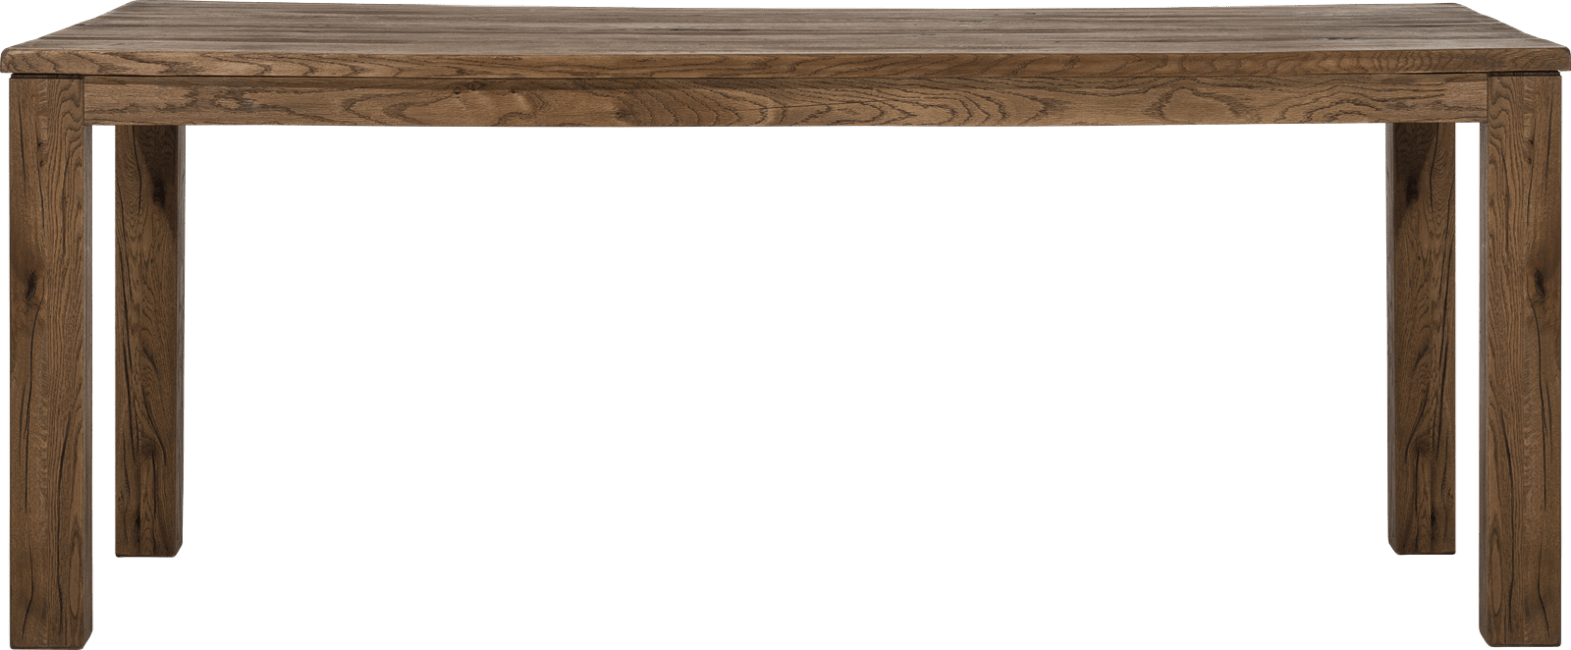 Masters - eetkamertafel 200 x 100 cm - hout 9x9